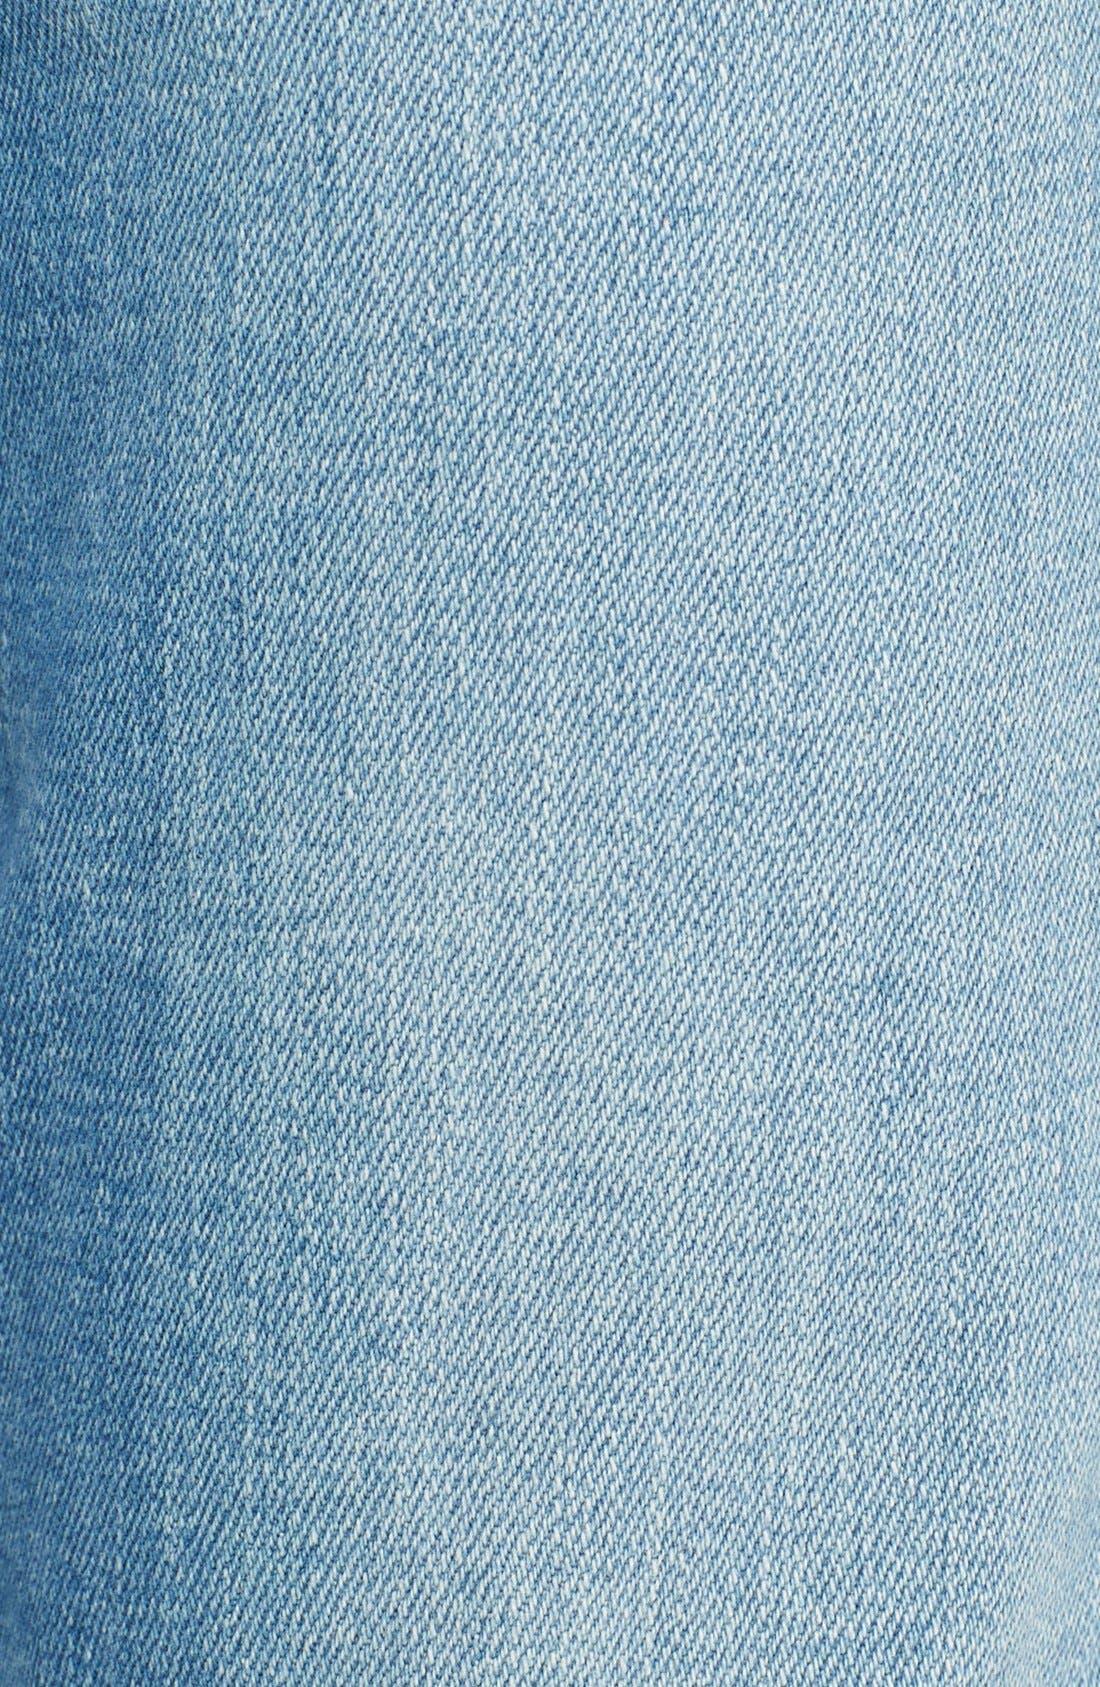 Alternate Image 3  - Frame Denim 'Le Garcon' Boyfriend Jeans (Exmouth)